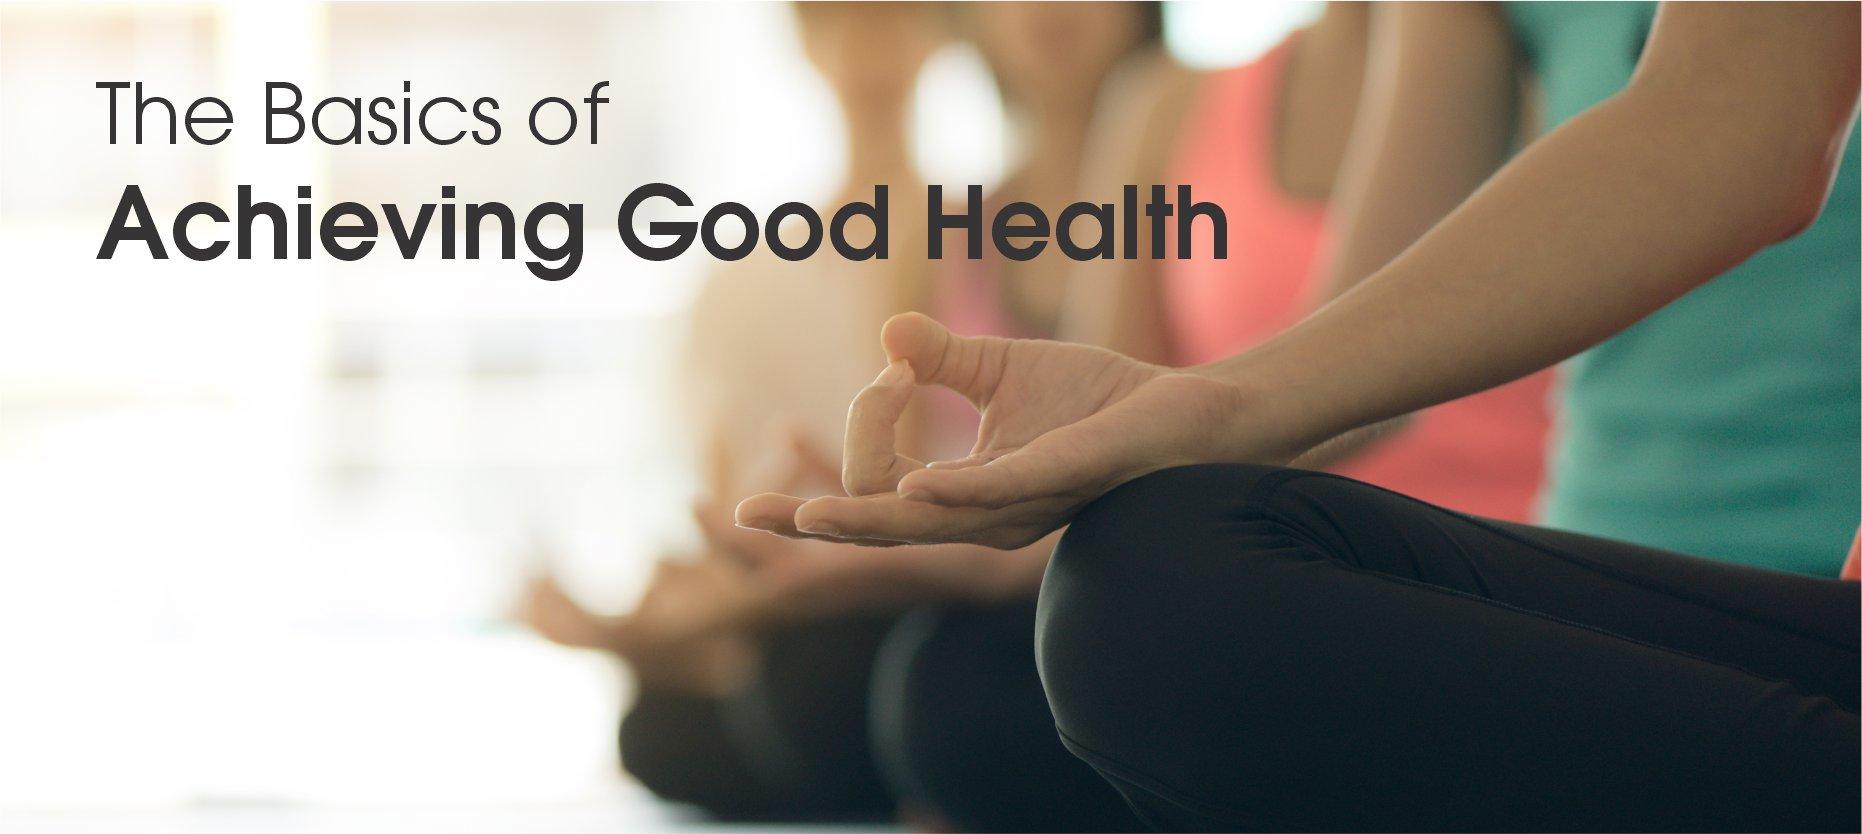 Achieving Good Health: The Basics